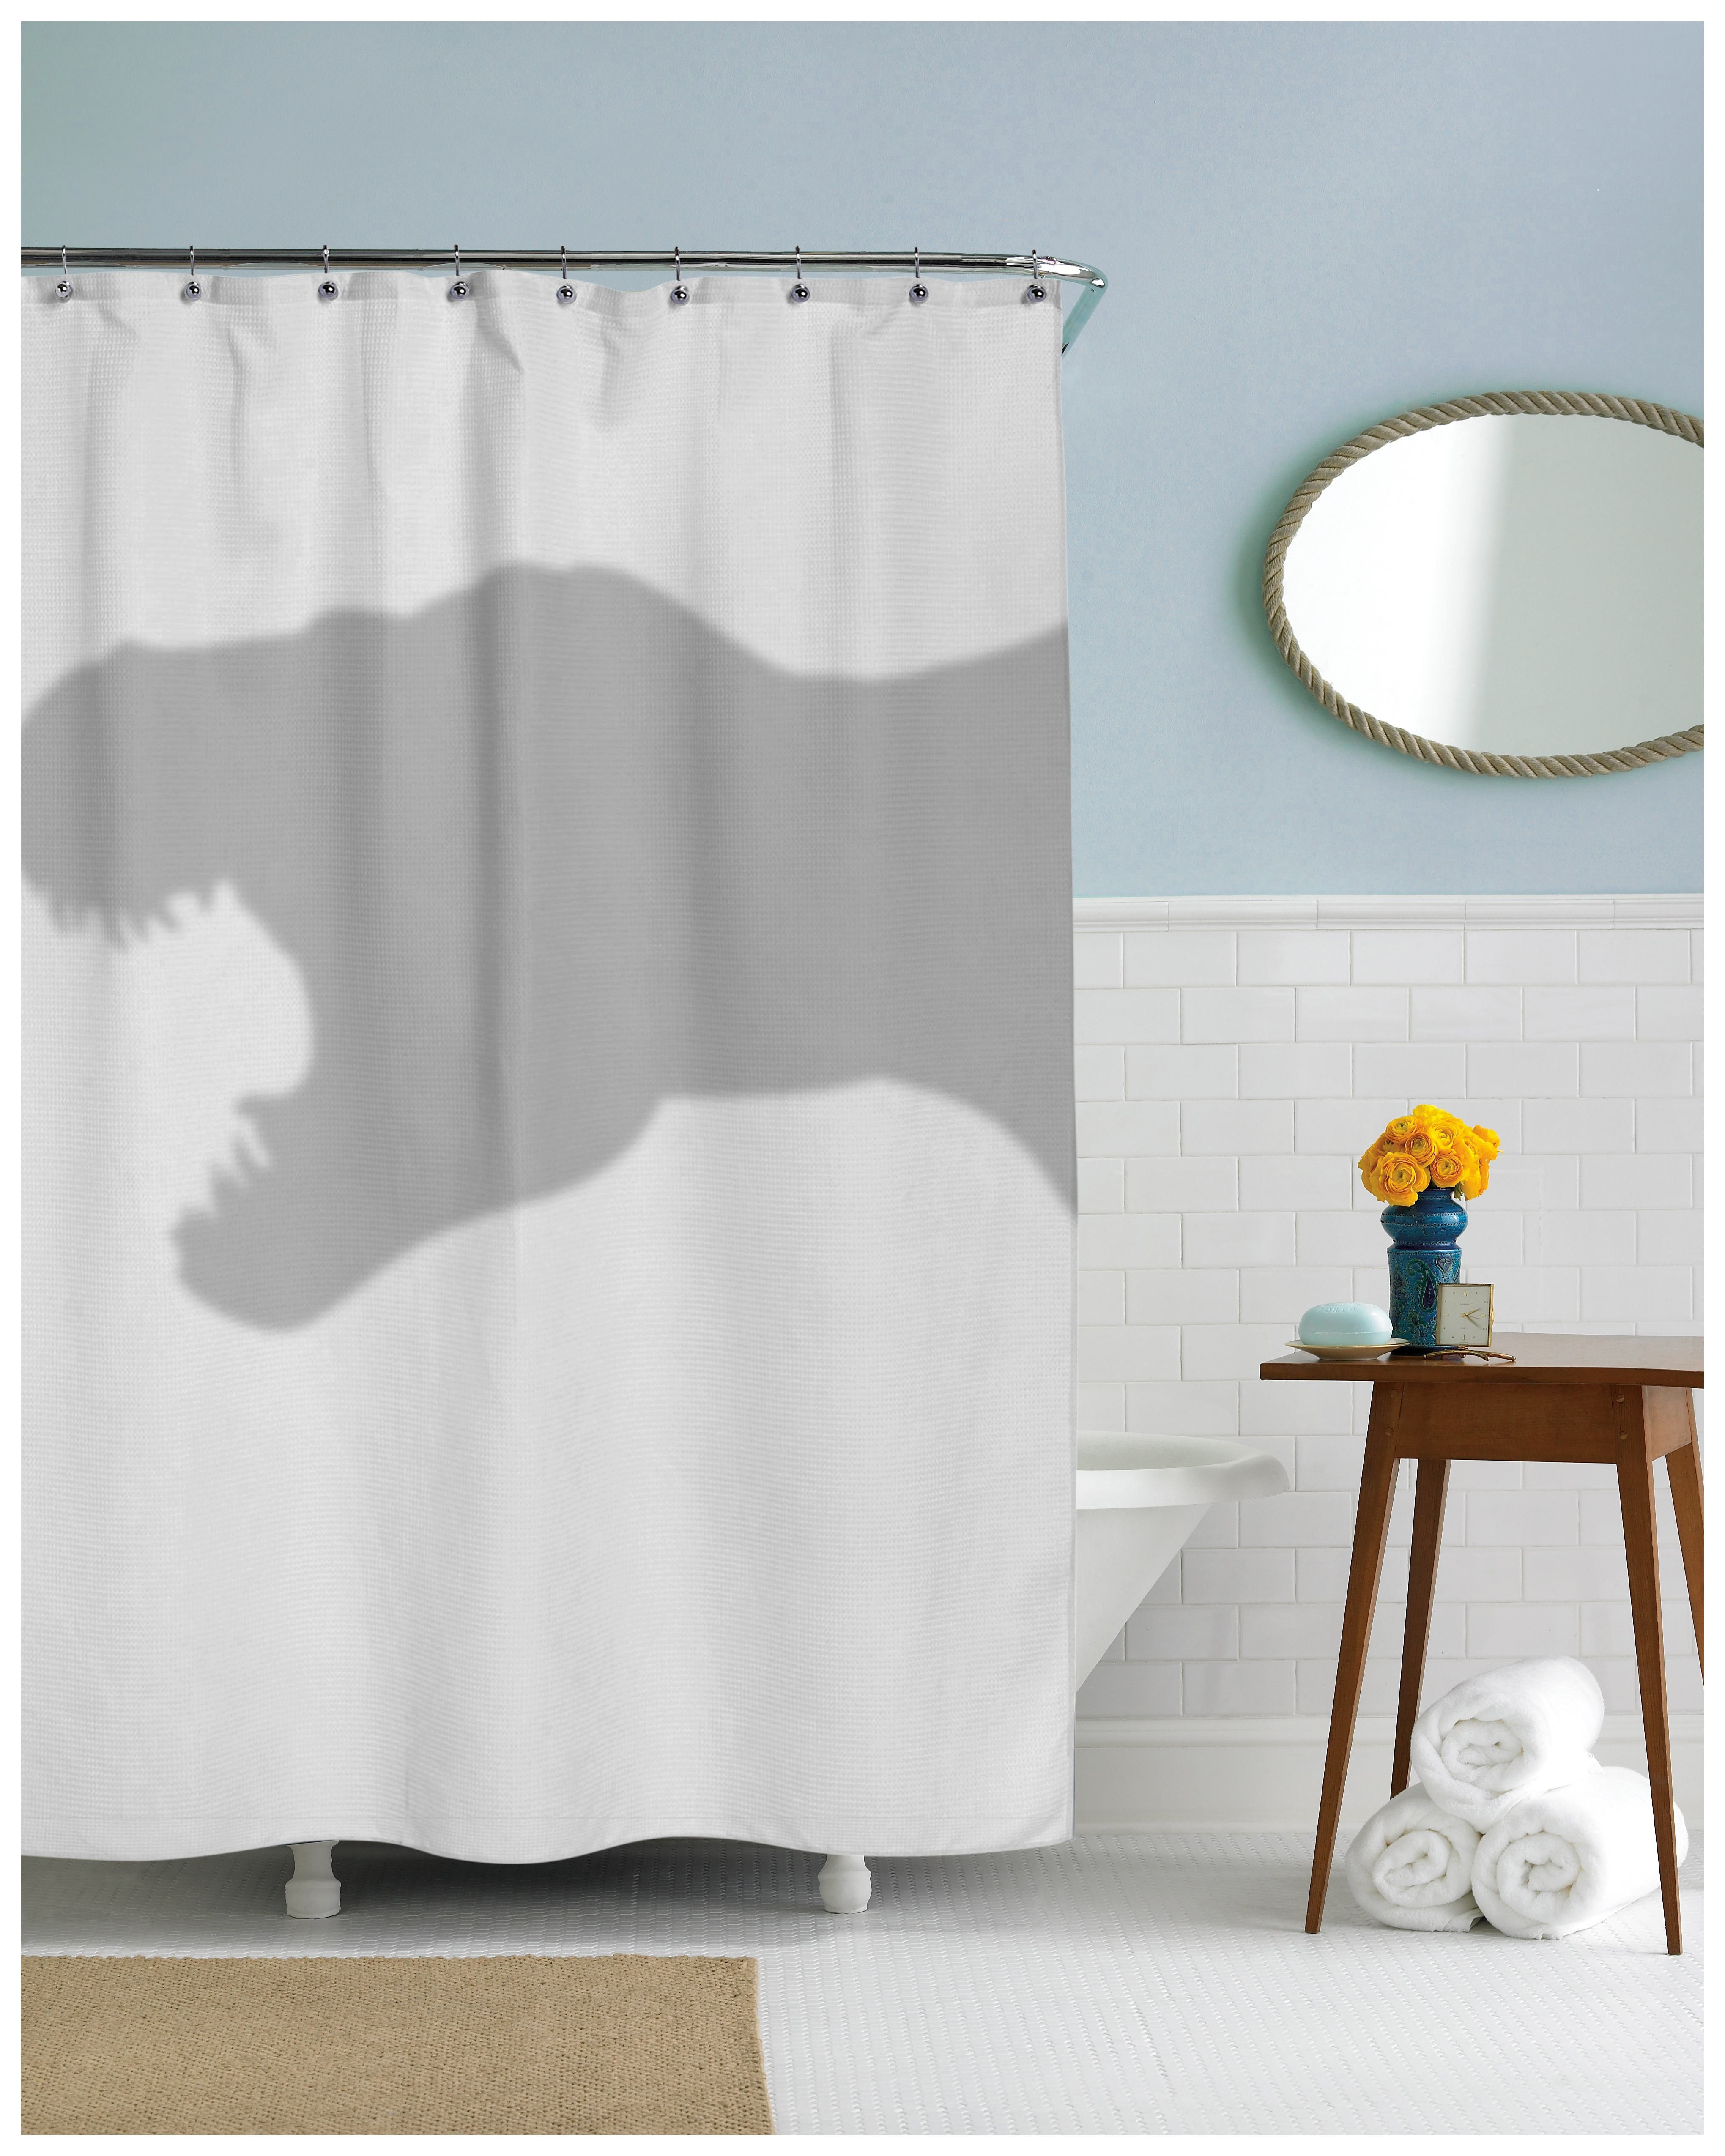 T-Rex Shower Curtain | Dinosaur Shower Curtain | Dinosaur Shower ...